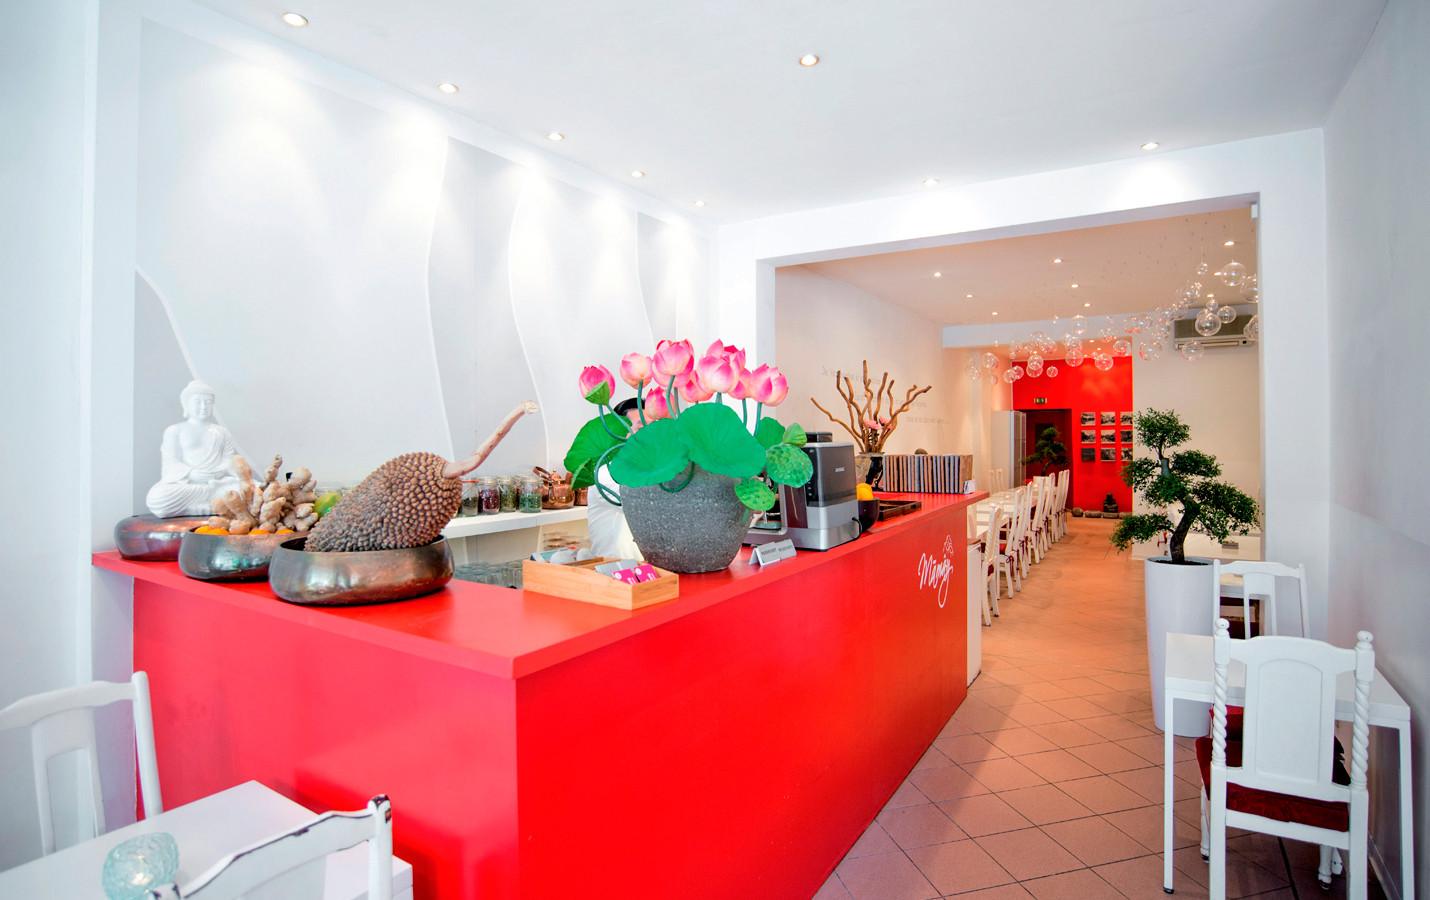 Restaurant mamay vietnamesische küche & teehaus